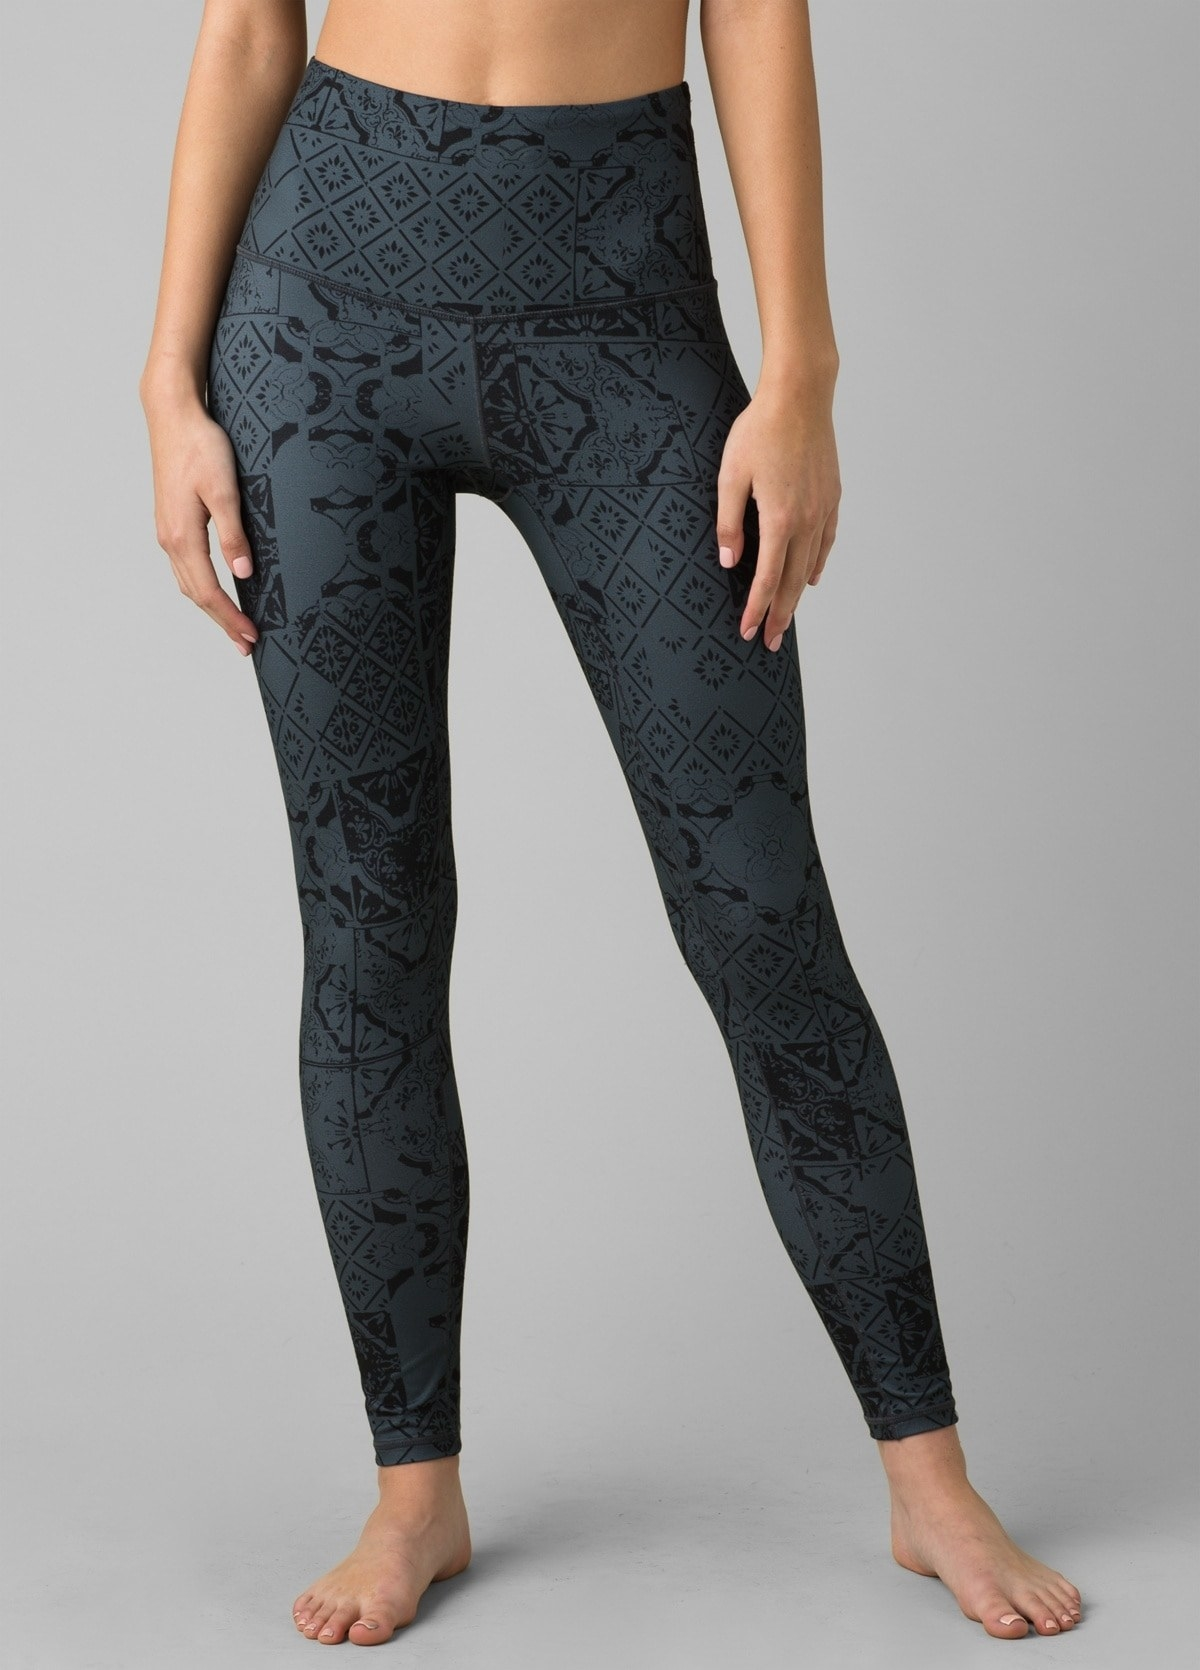 model in grey and black patterned leggings